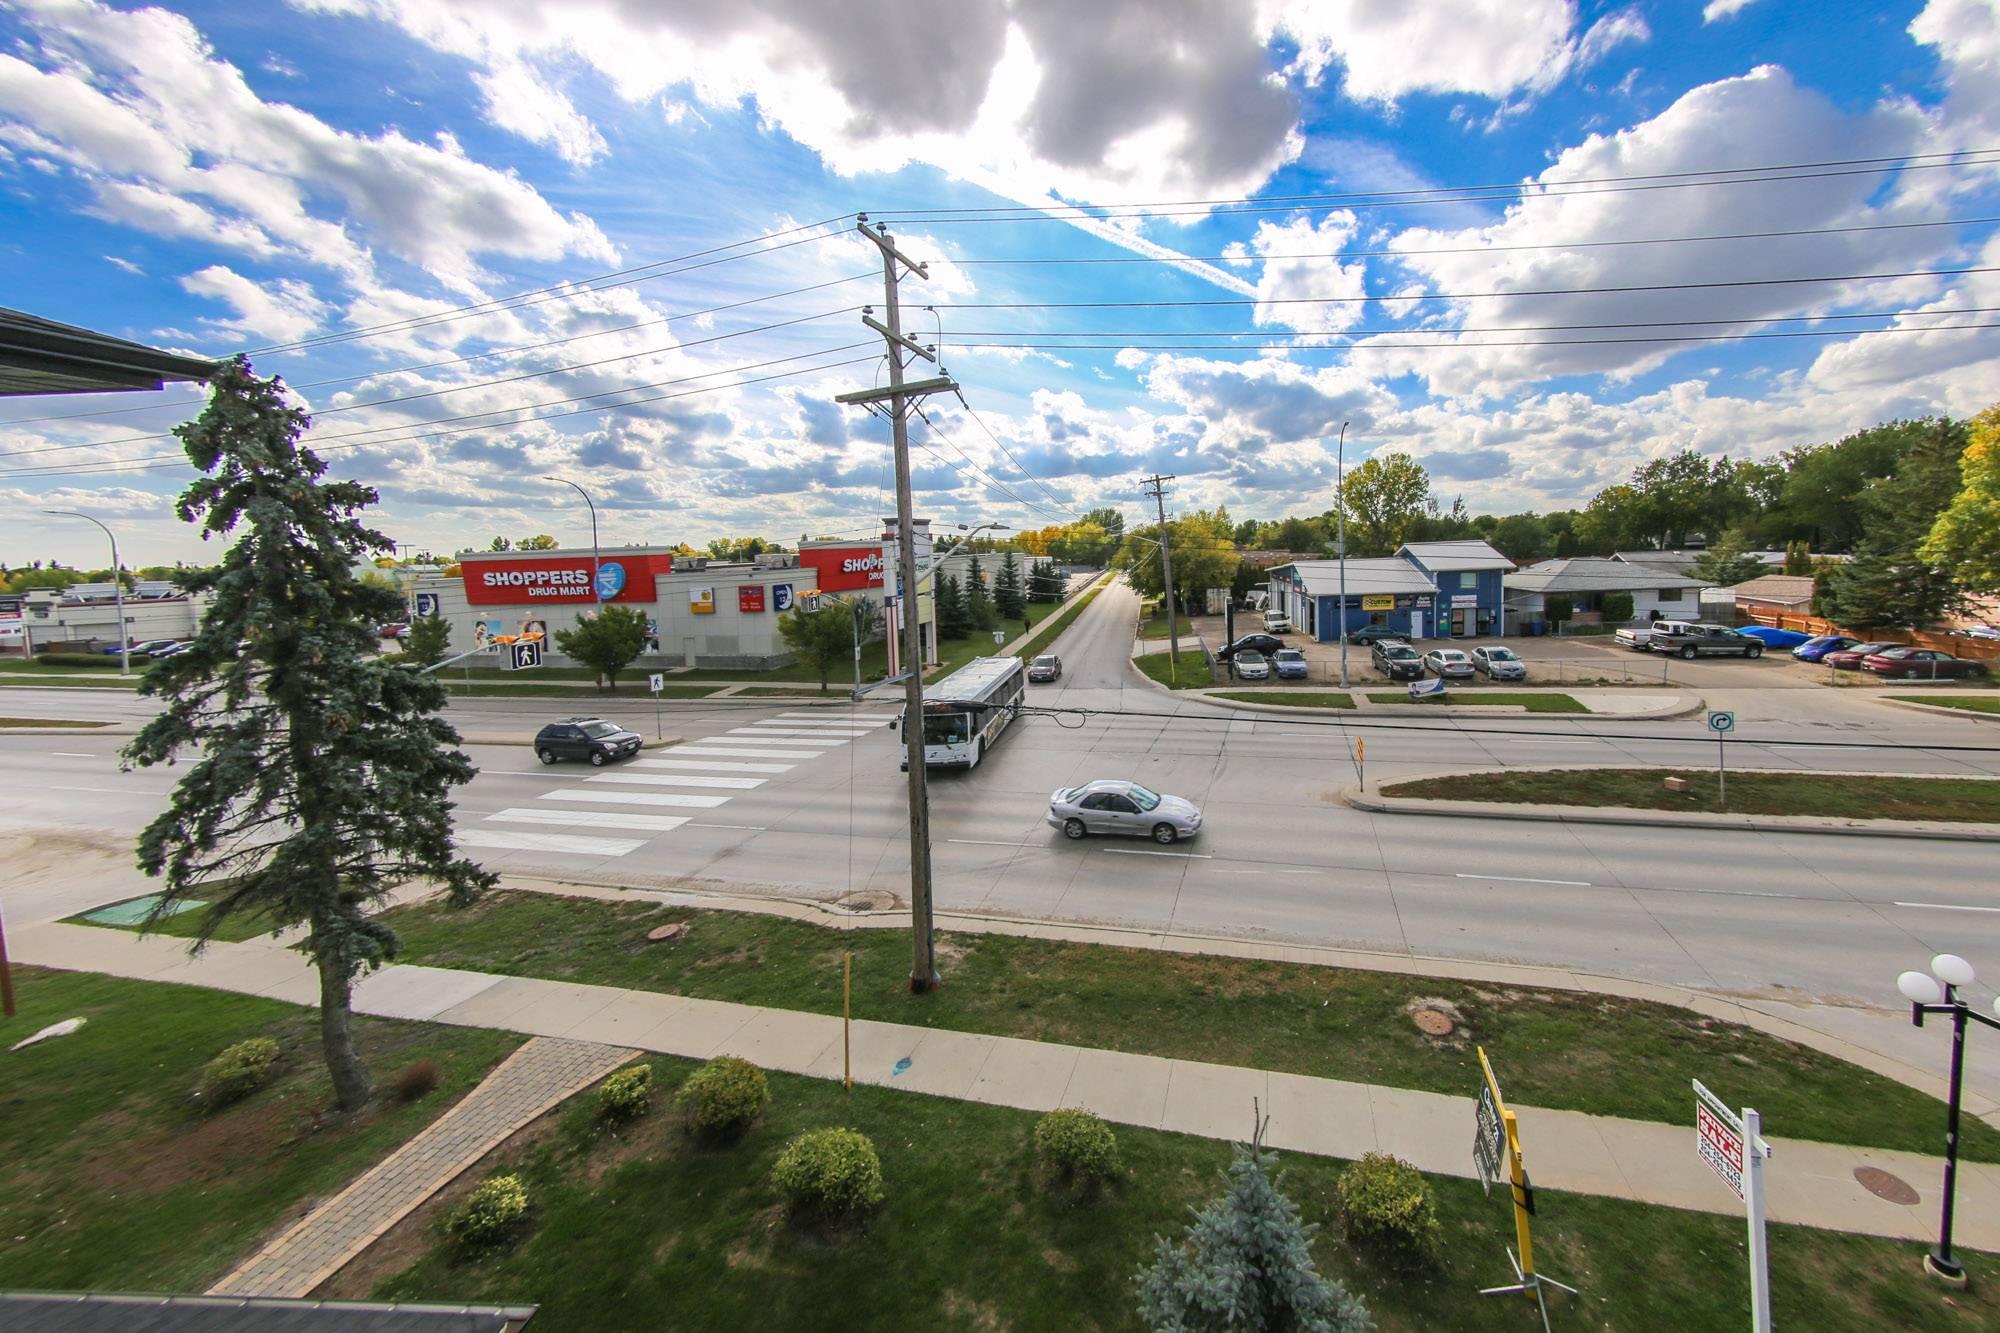 336-701 St Annes, Winnipeg, Manitoba  R2M 3B3 - Photo 26 - 1825923